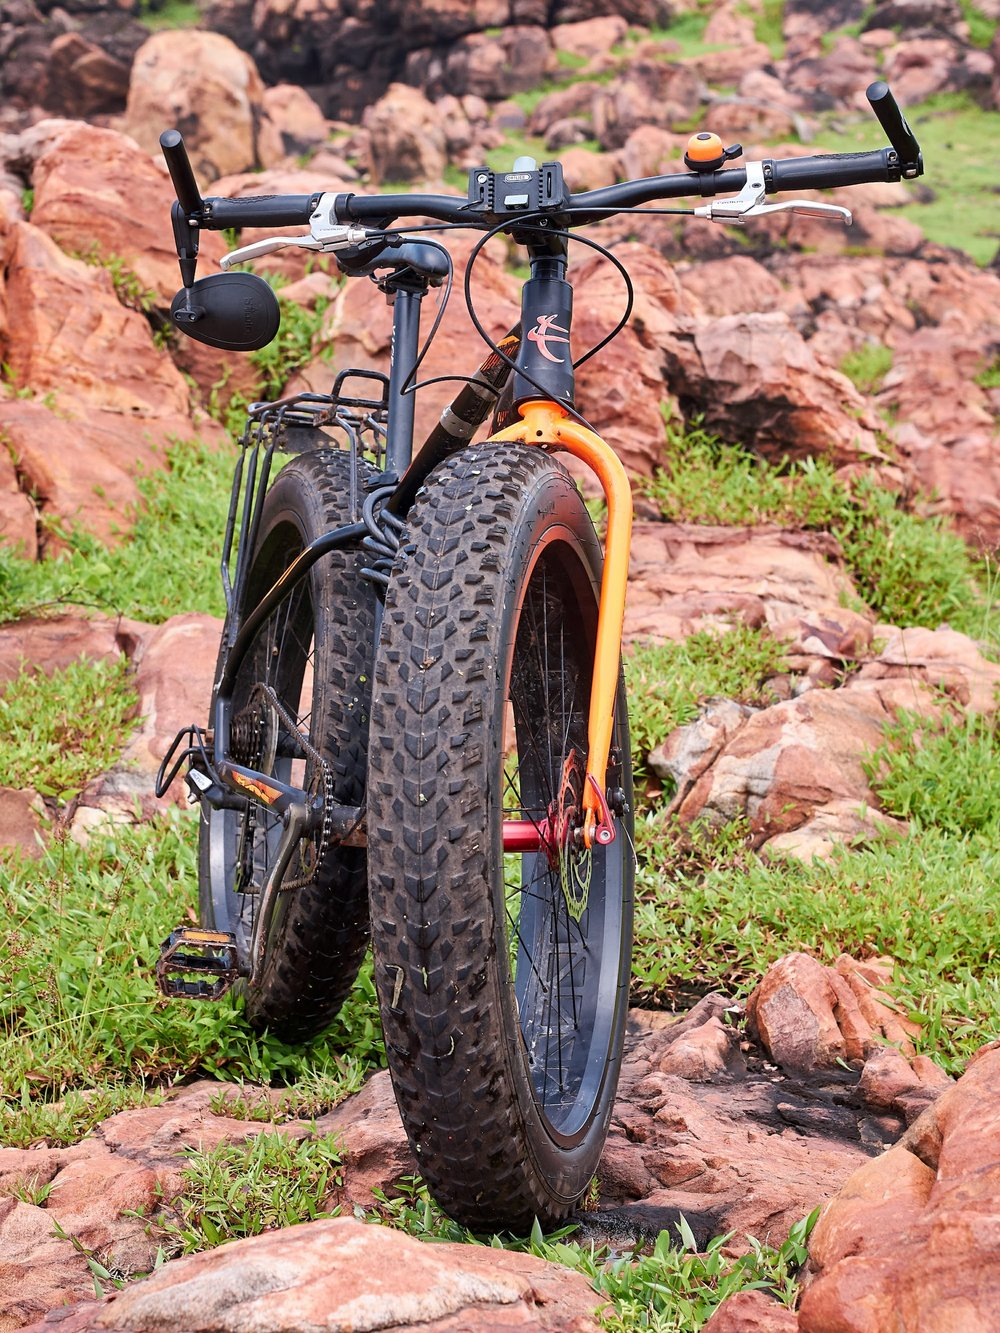 Fittrip Marine Fatbike Review India Konkan Bicycle Touring Bikepacking.jpg